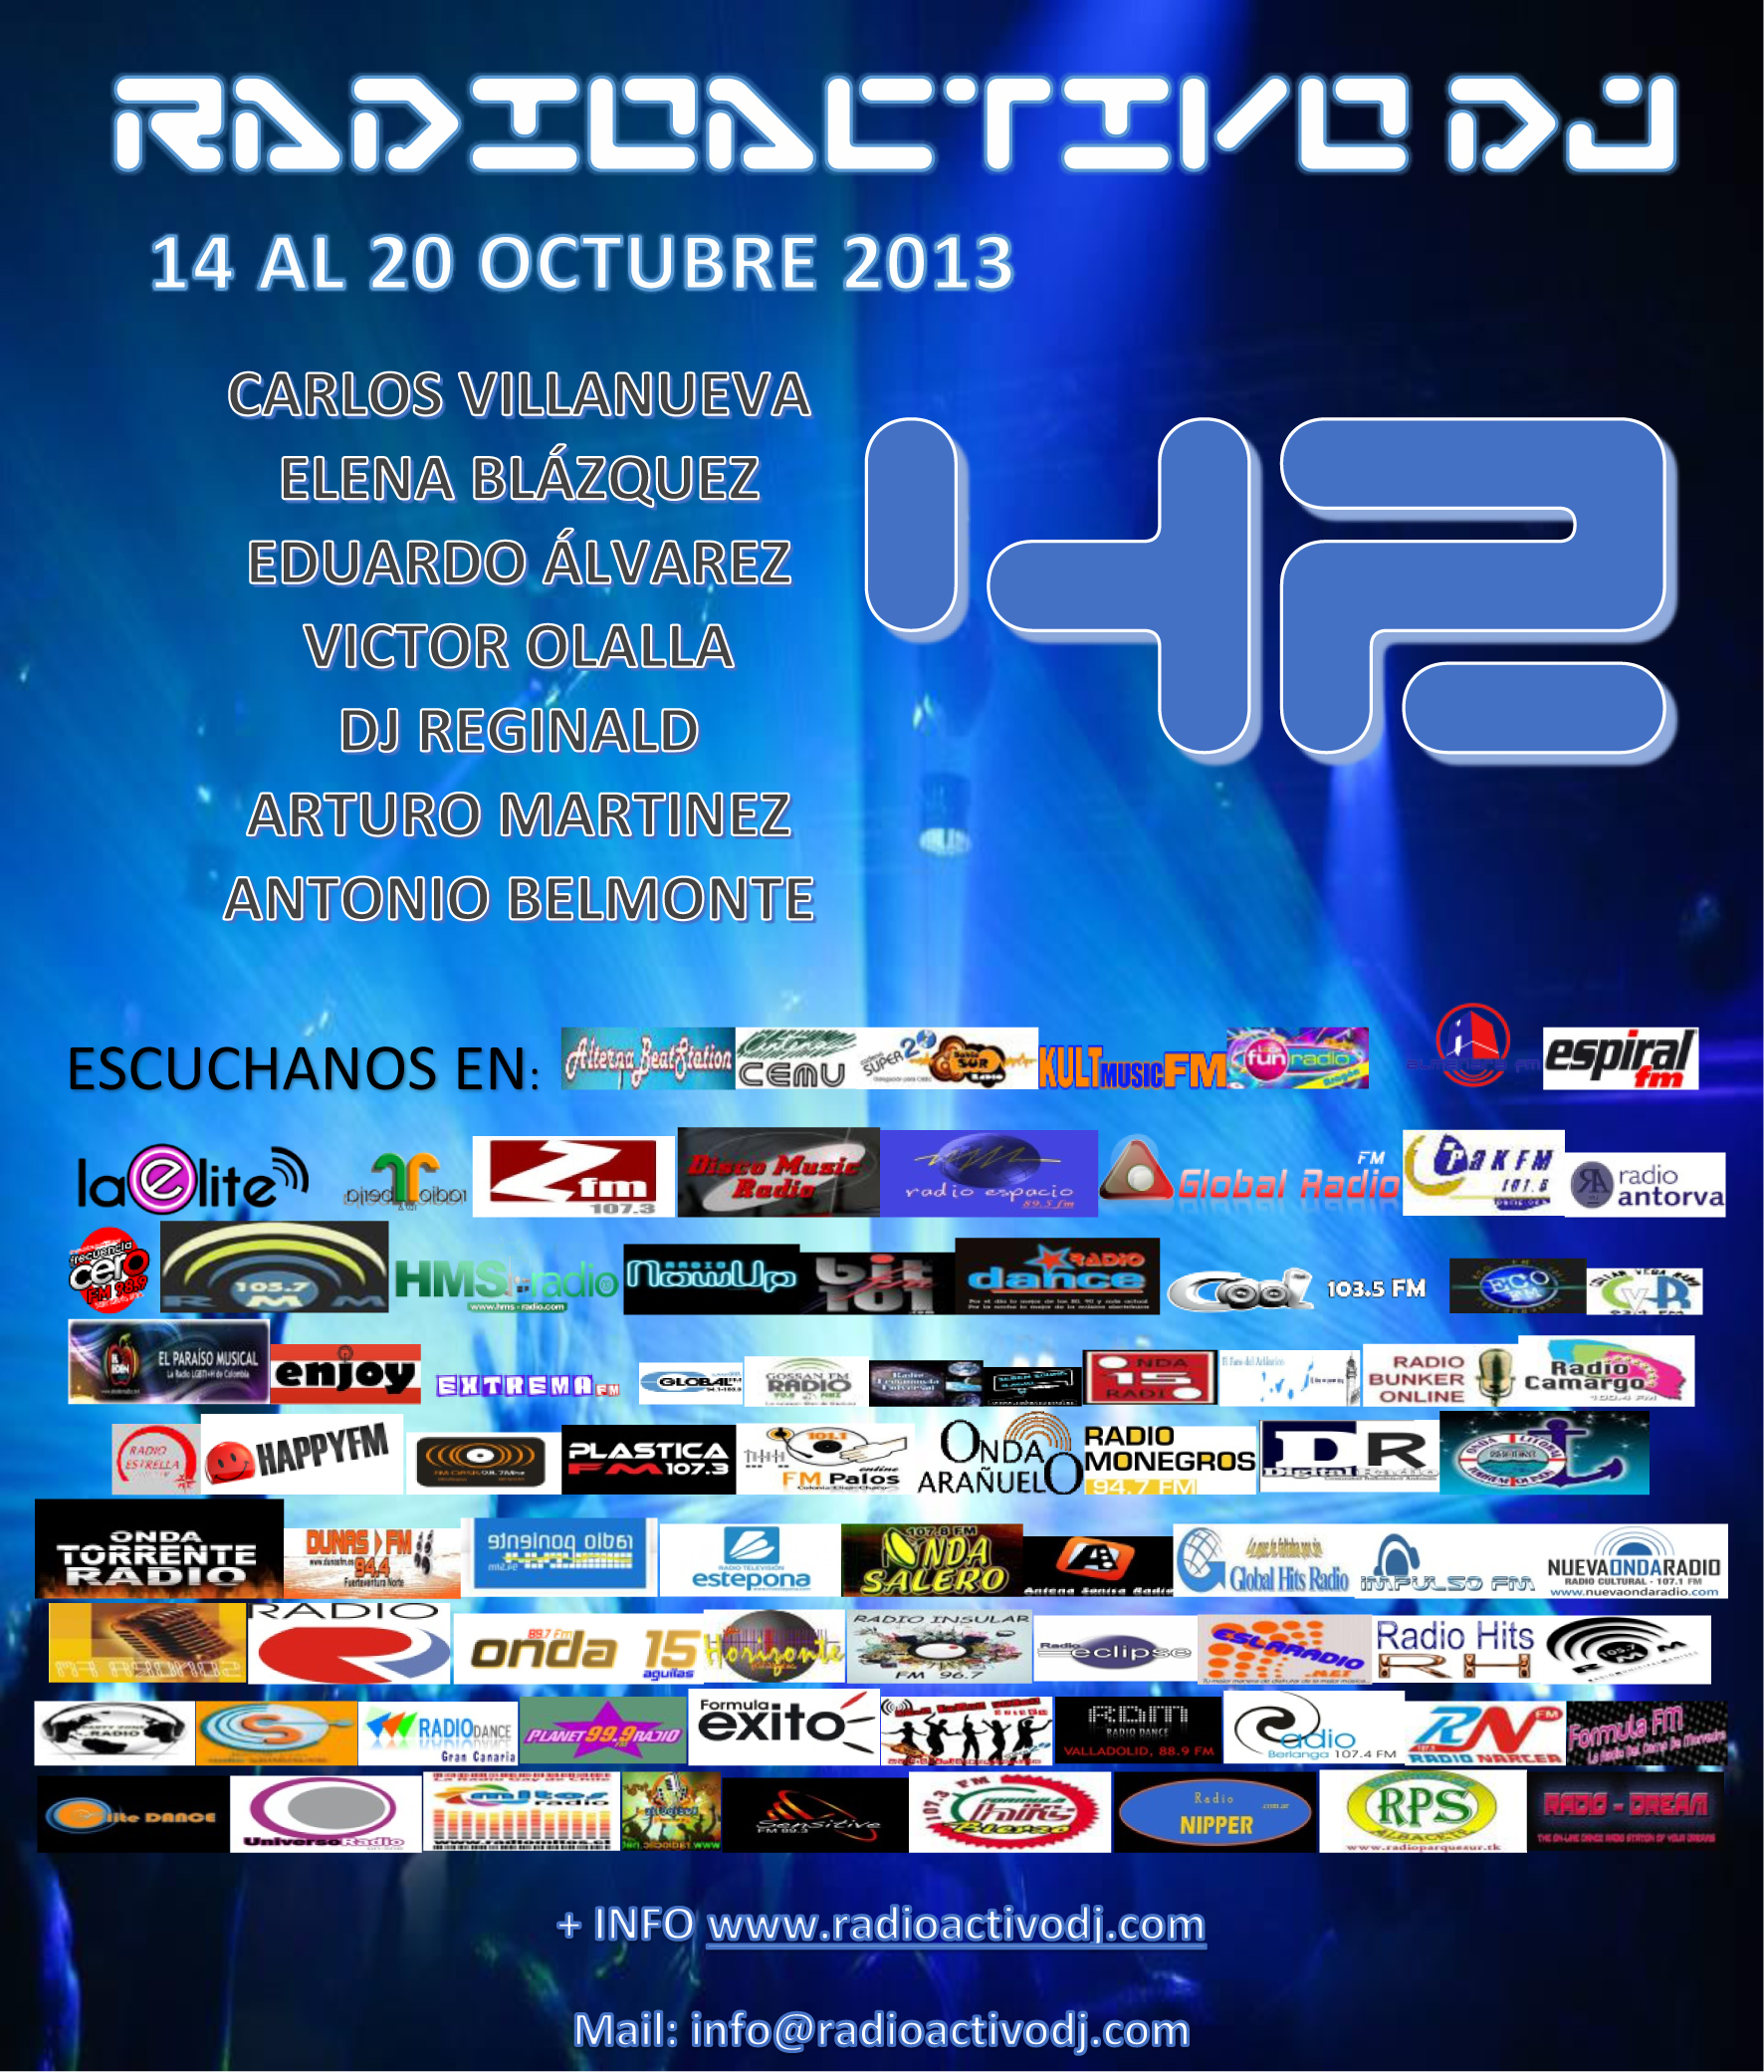 RADIOACTIVO DJ 42-2013